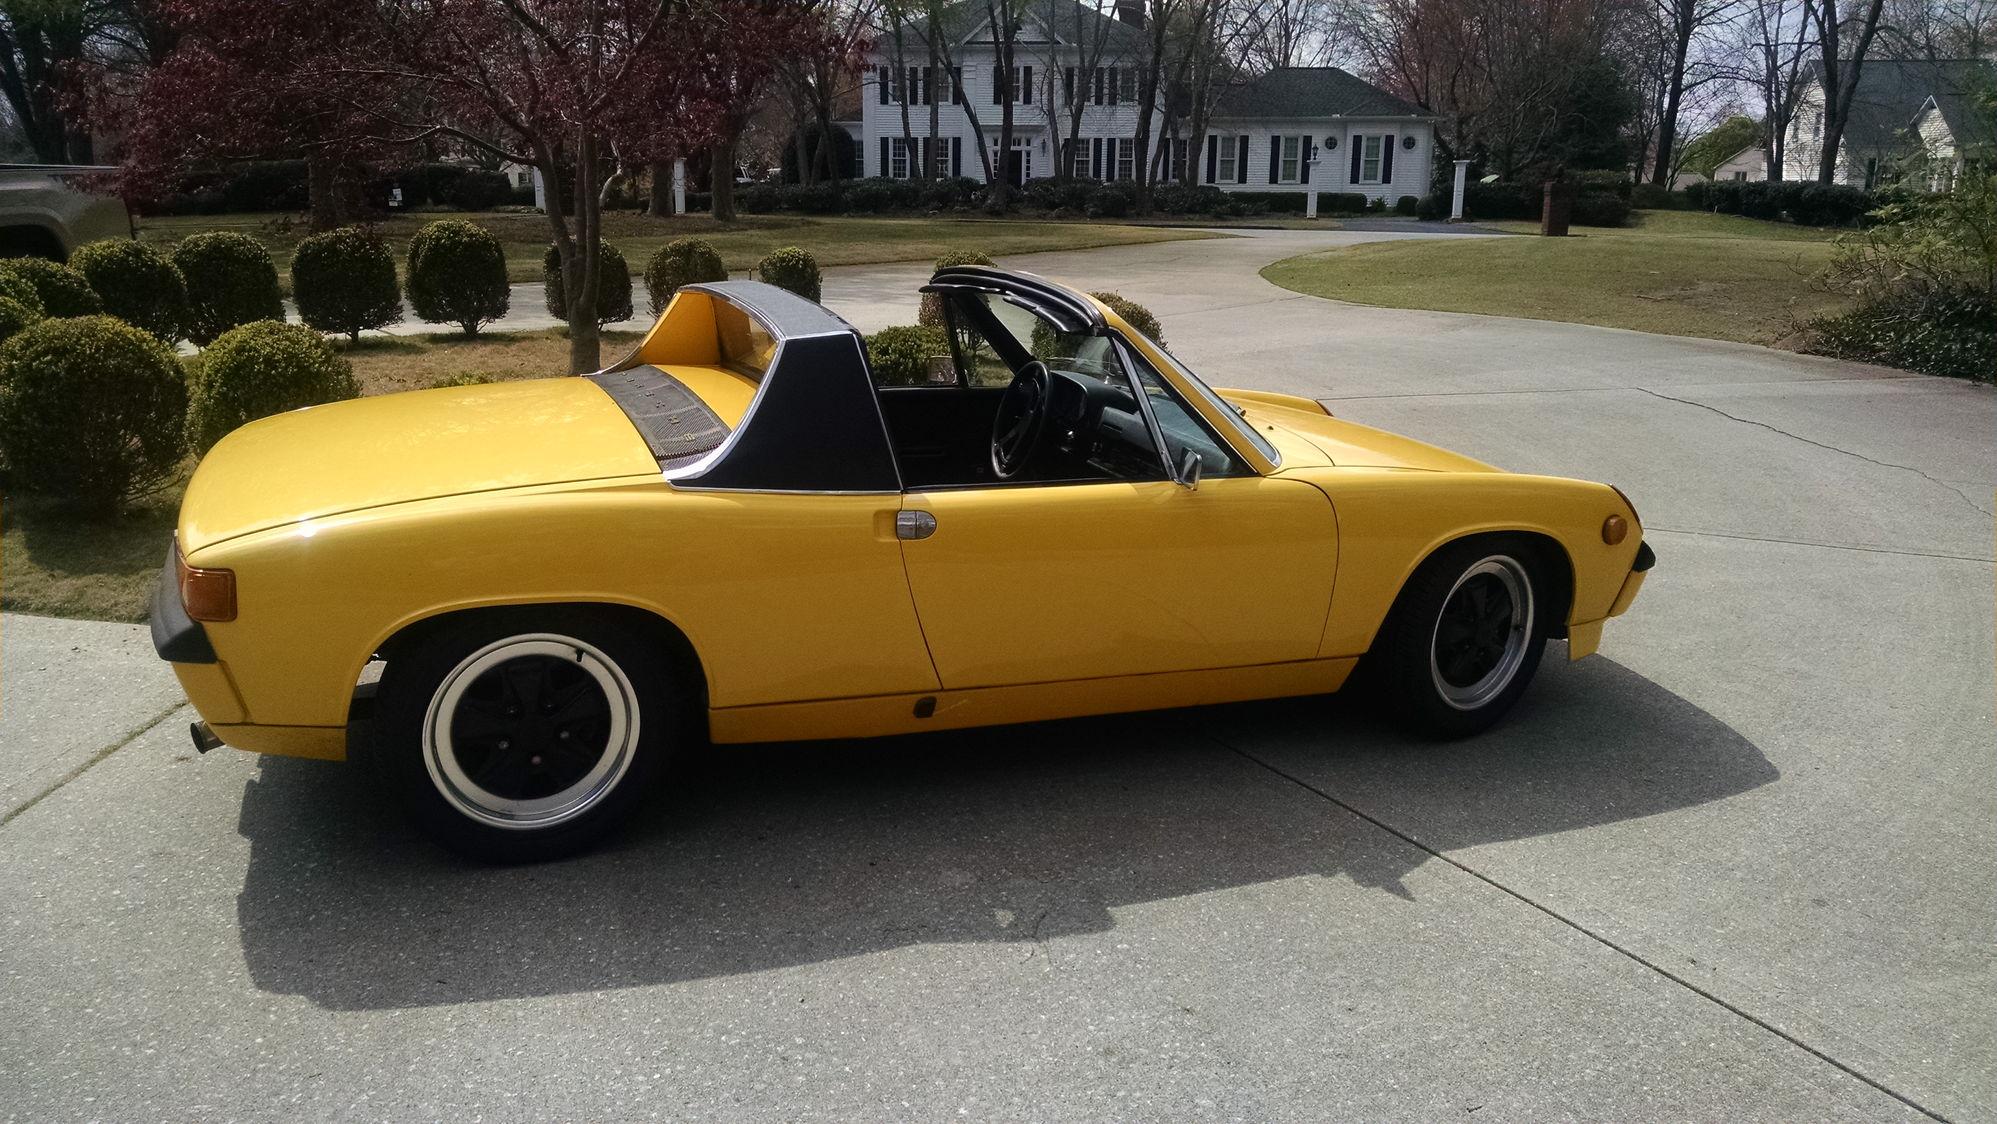 Used Cars Greenville Sc >> 914-6 conversion - Rennlist - Porsche Discussion Forums